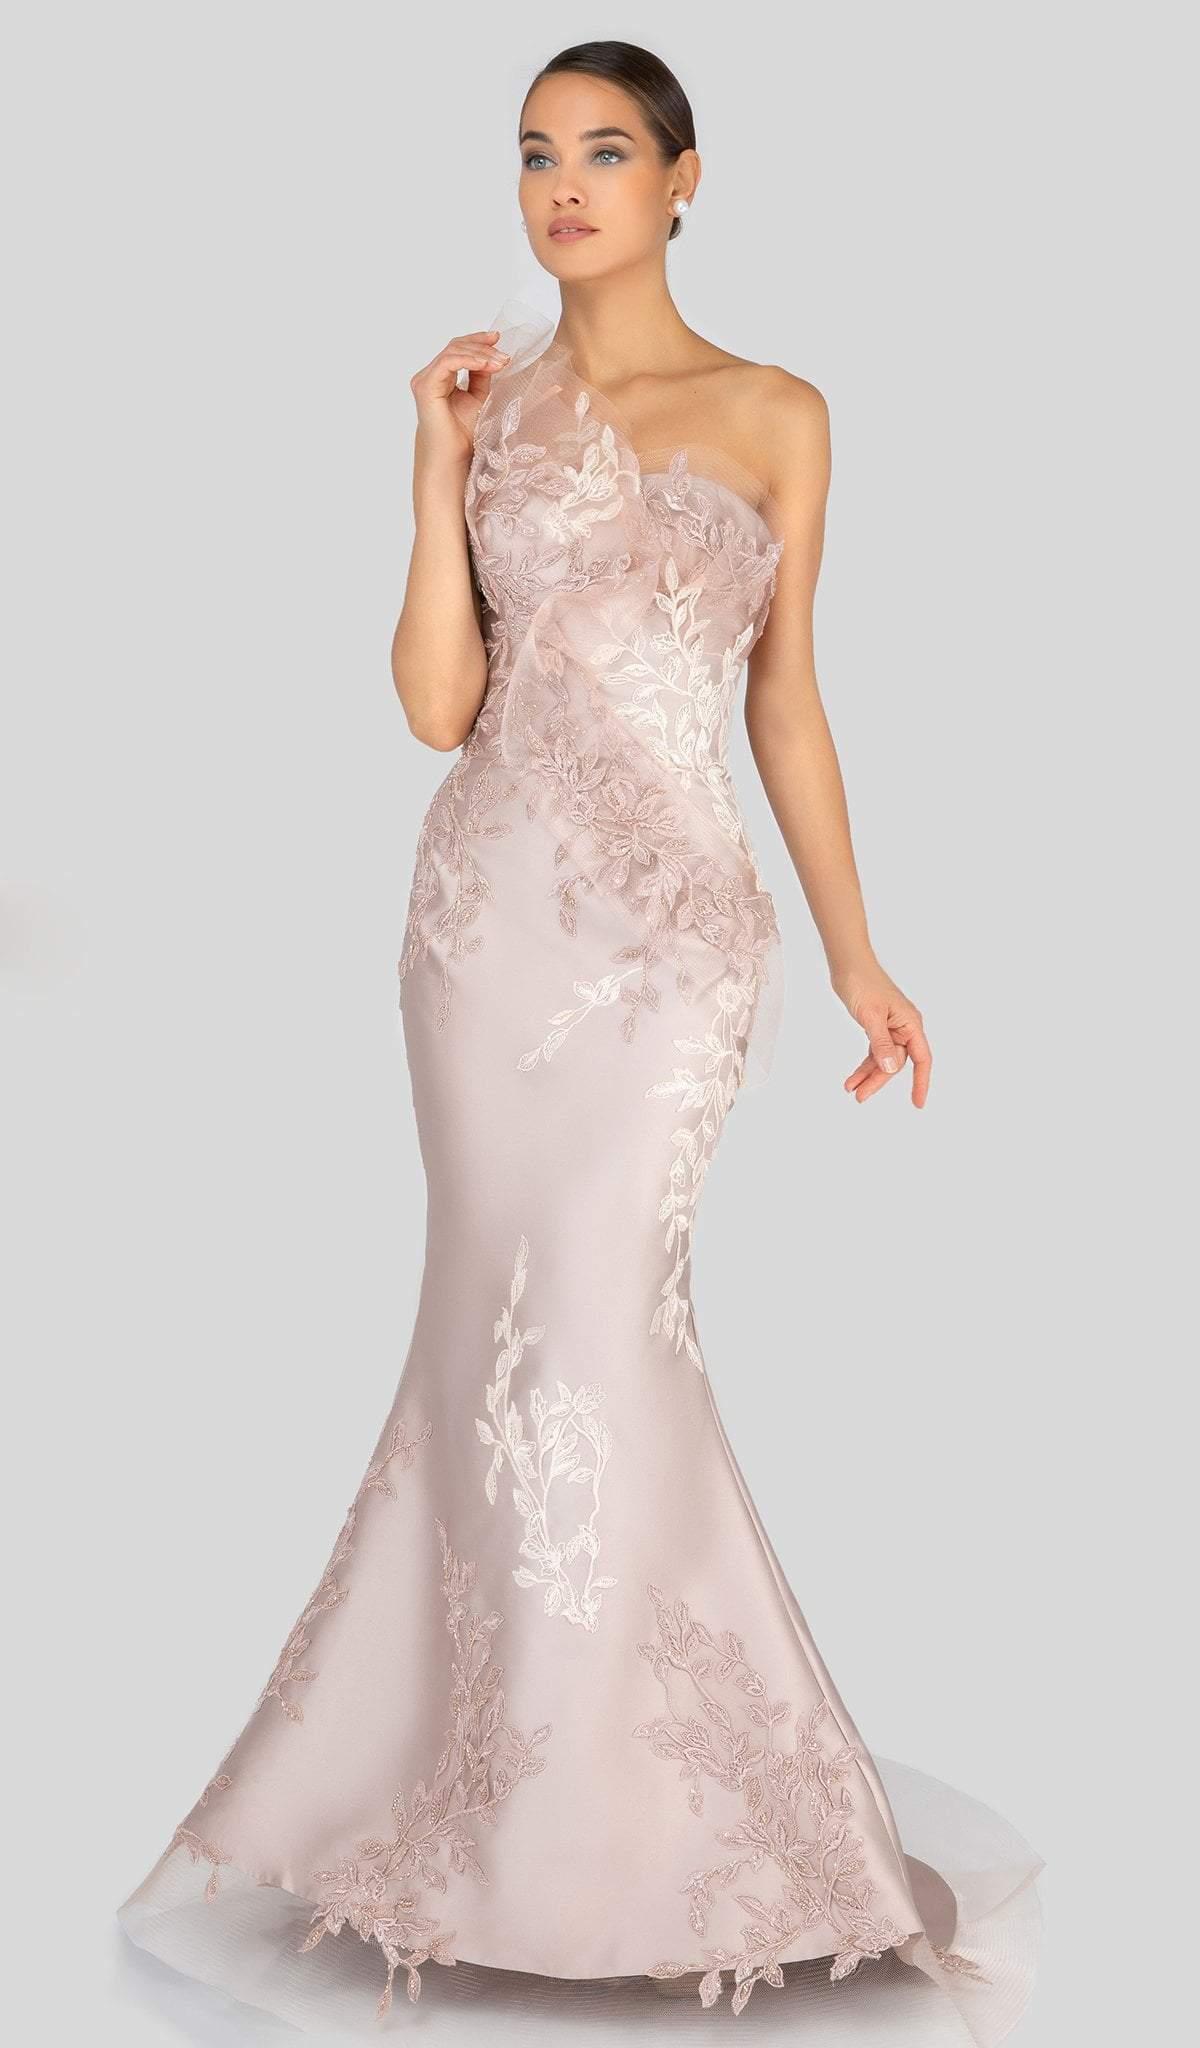 Terani Couture - 1911E9095 Embroidered Asymmetric Neck Mermaid Gown